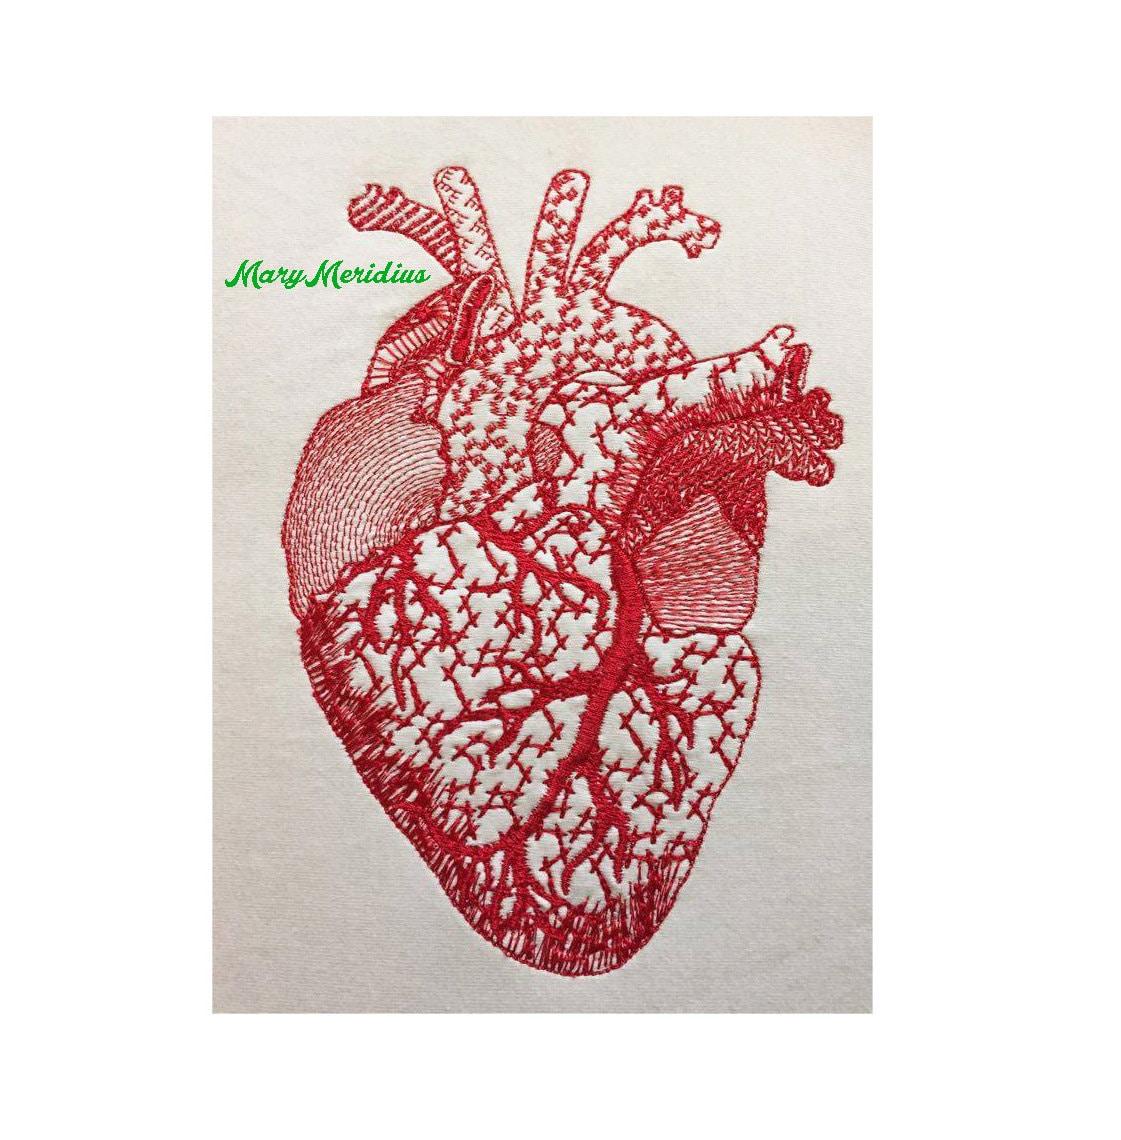 Human Heart Machine Embroidery Design MaryMeridius Redwork